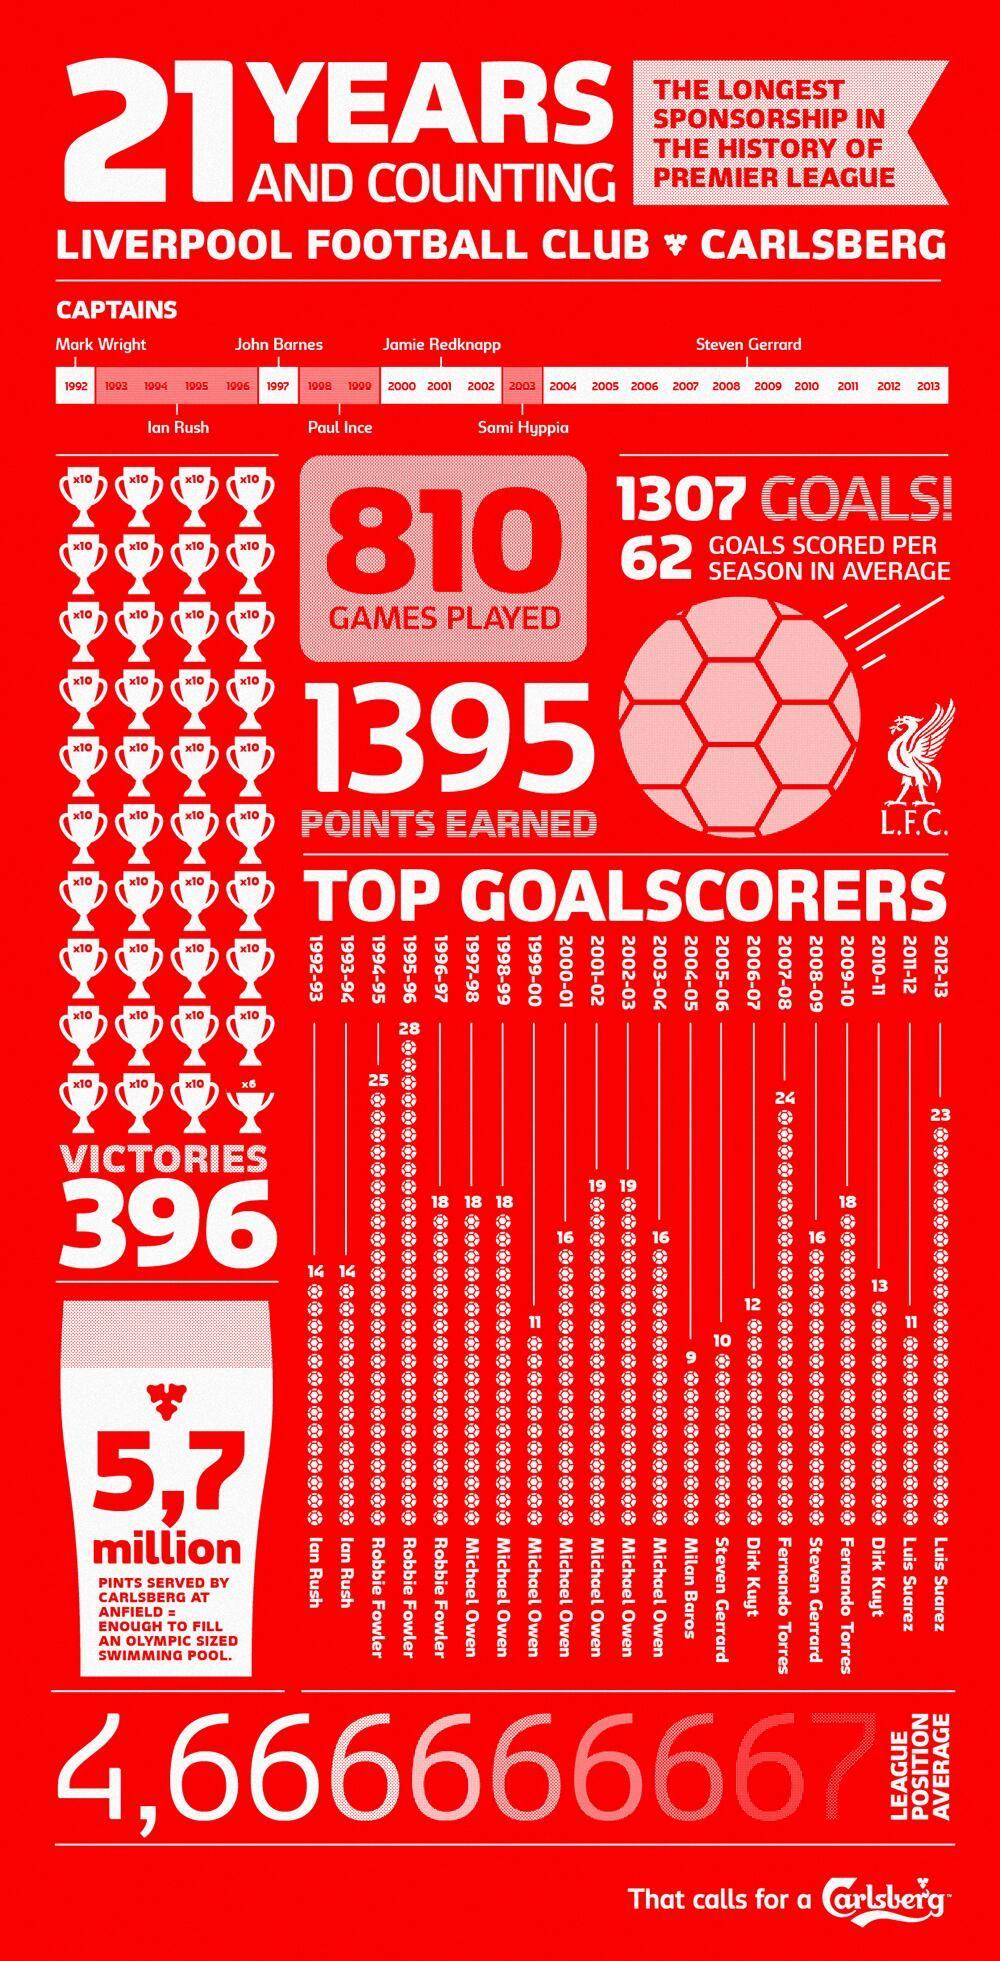 Carlsberg On Twitter Liverpool Football Club Liverpool Liverpool Football